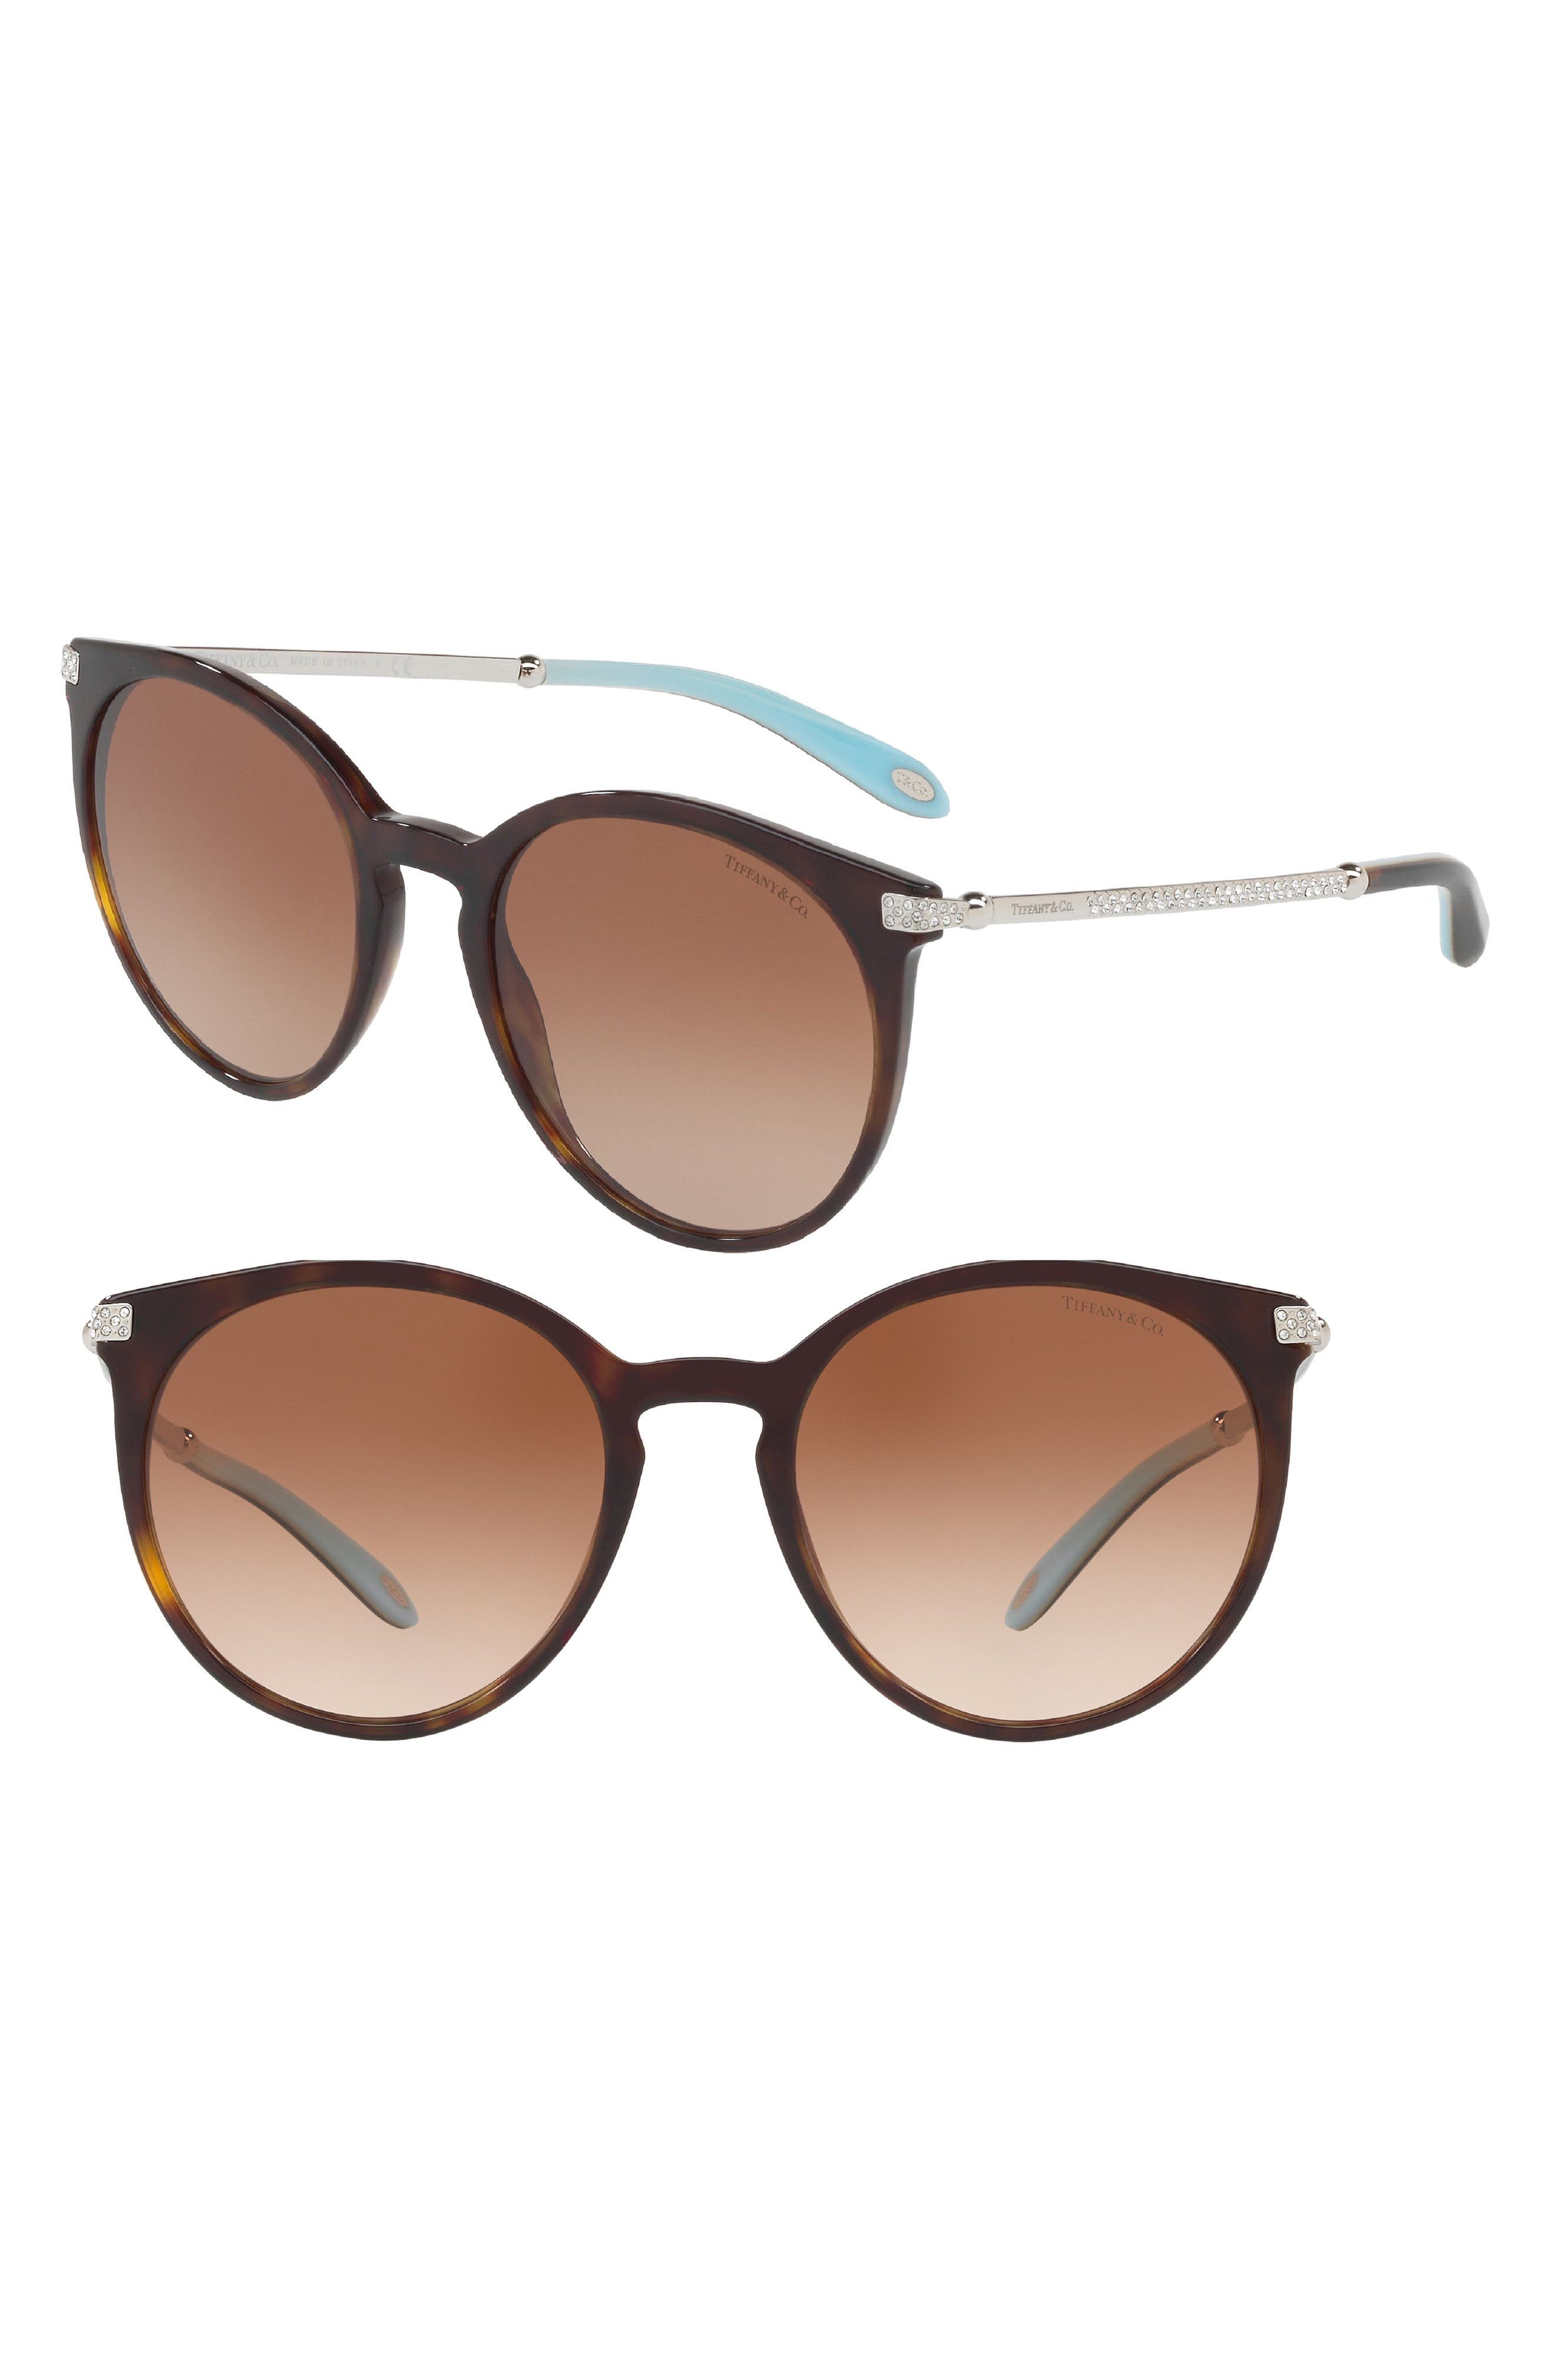 54mm Gradient Round Sunglasses,                             Main thumbnail 1, color,                             Dark Havana